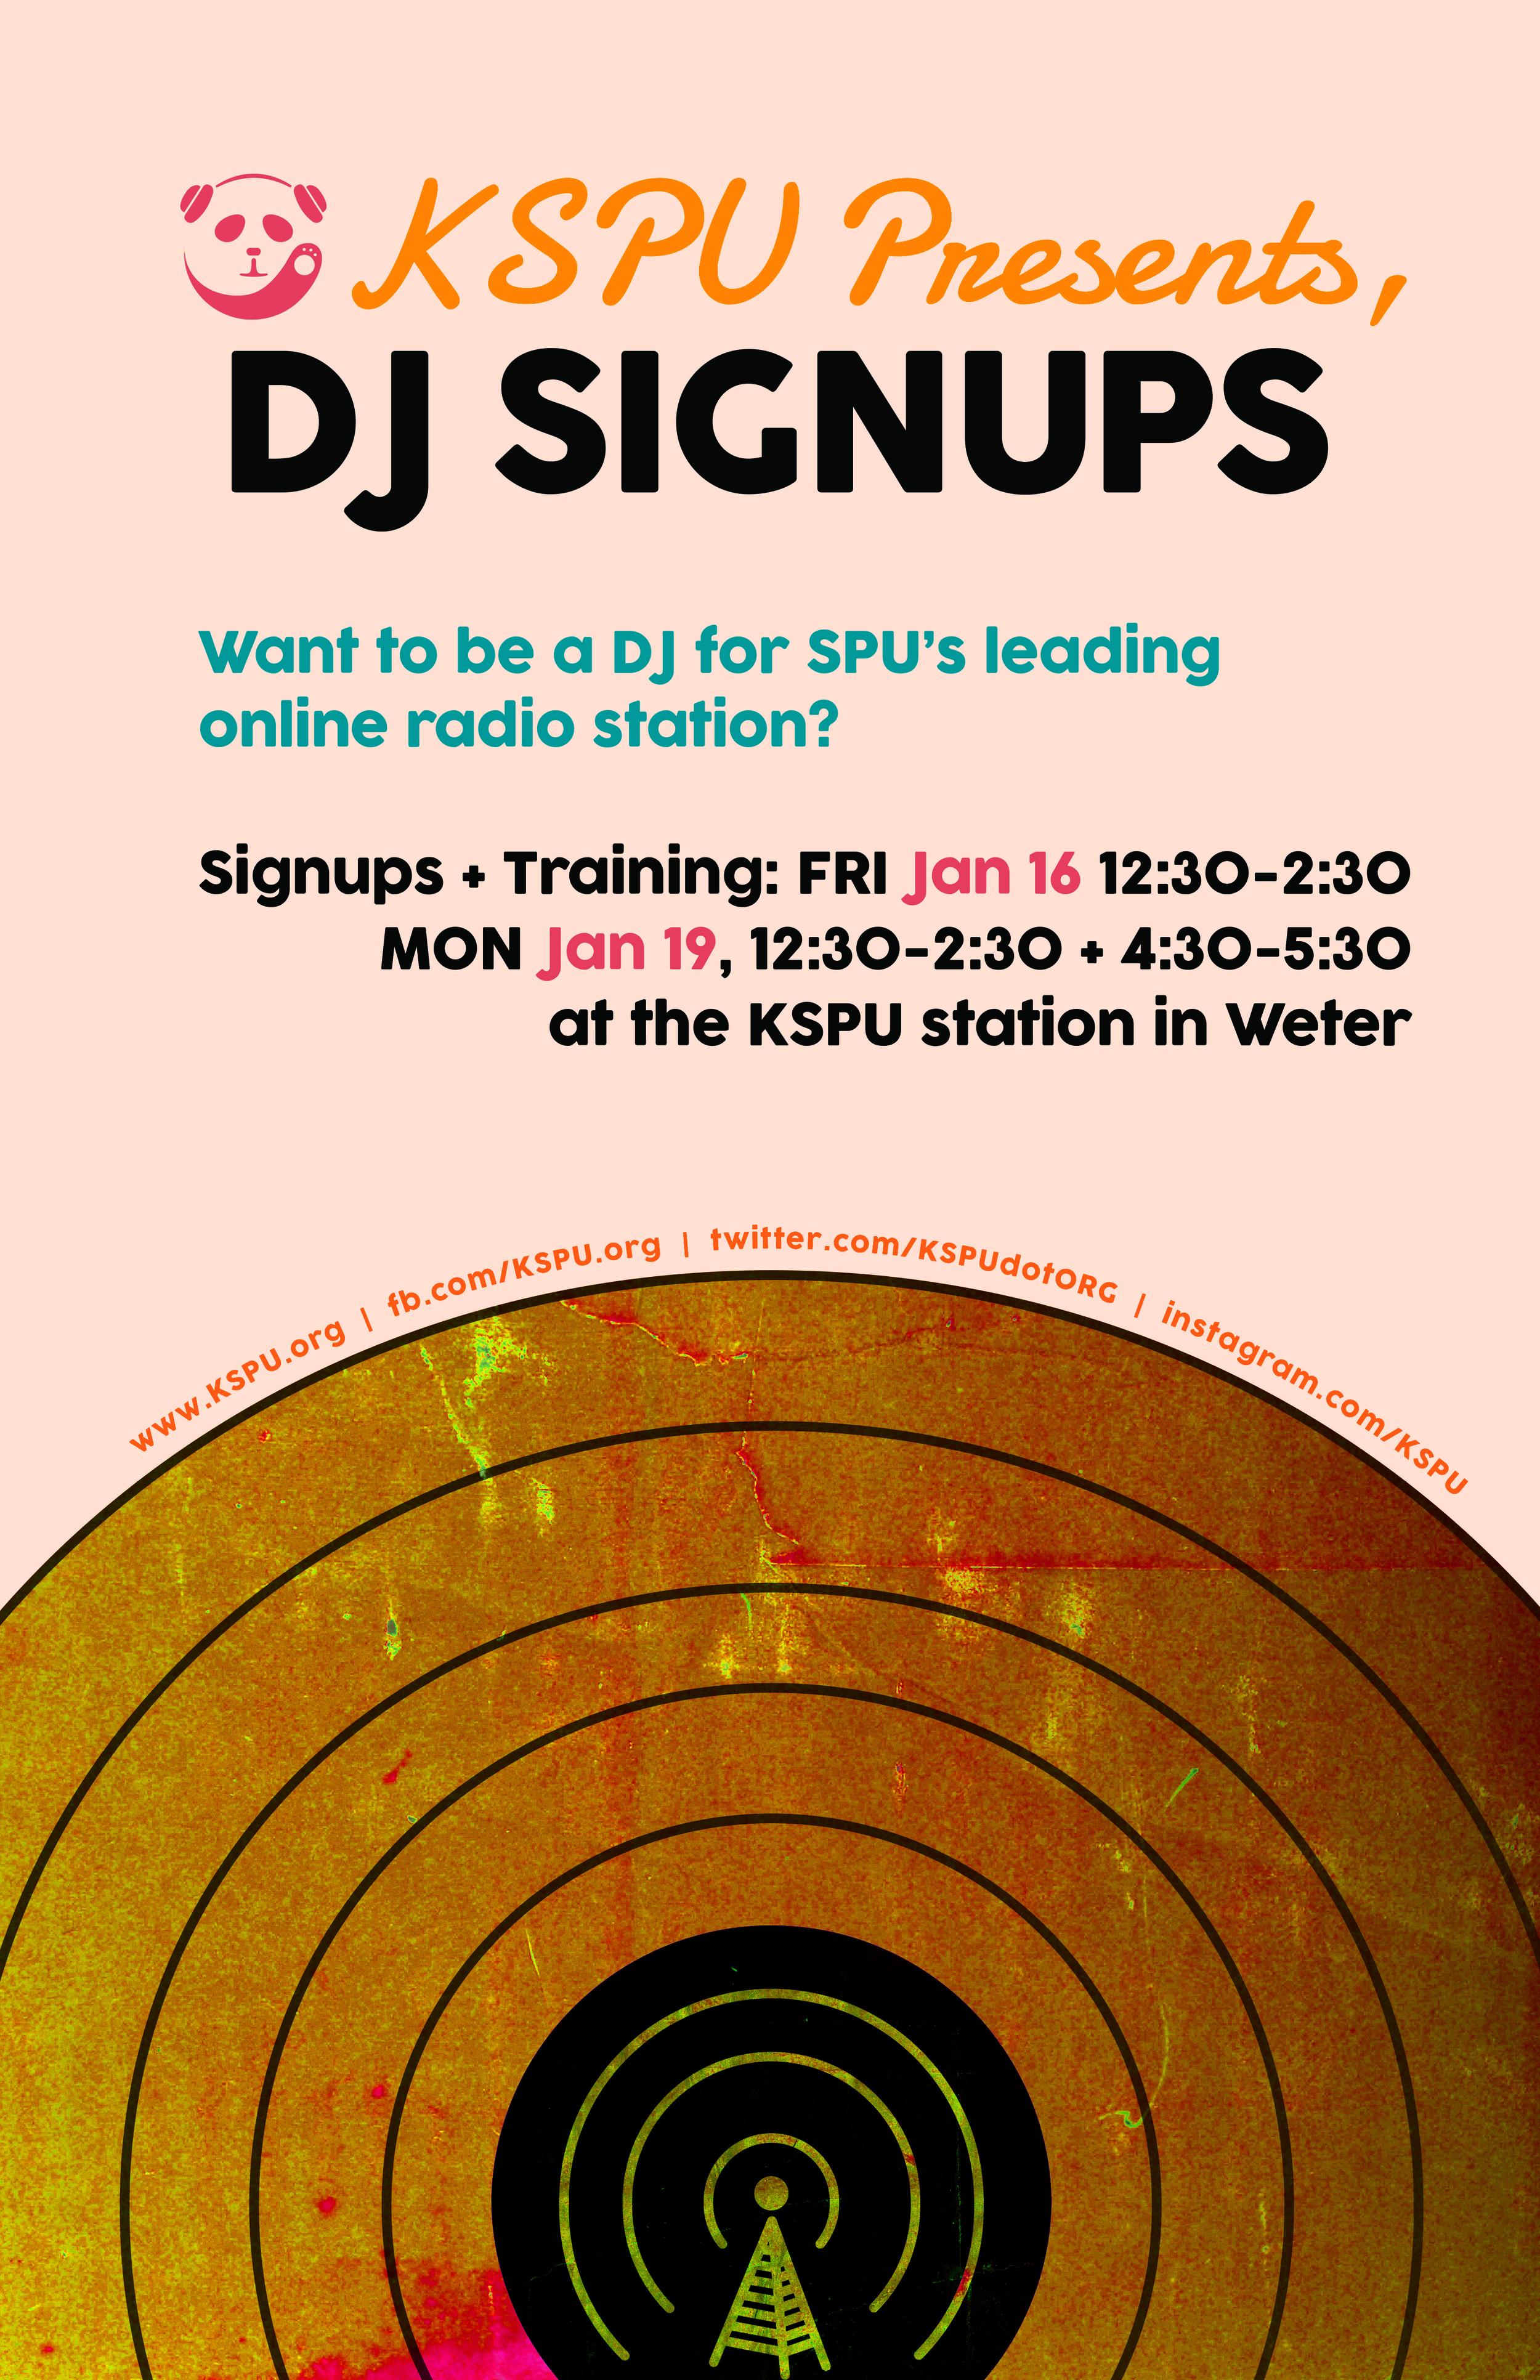 KSPU DJ signups winter 15